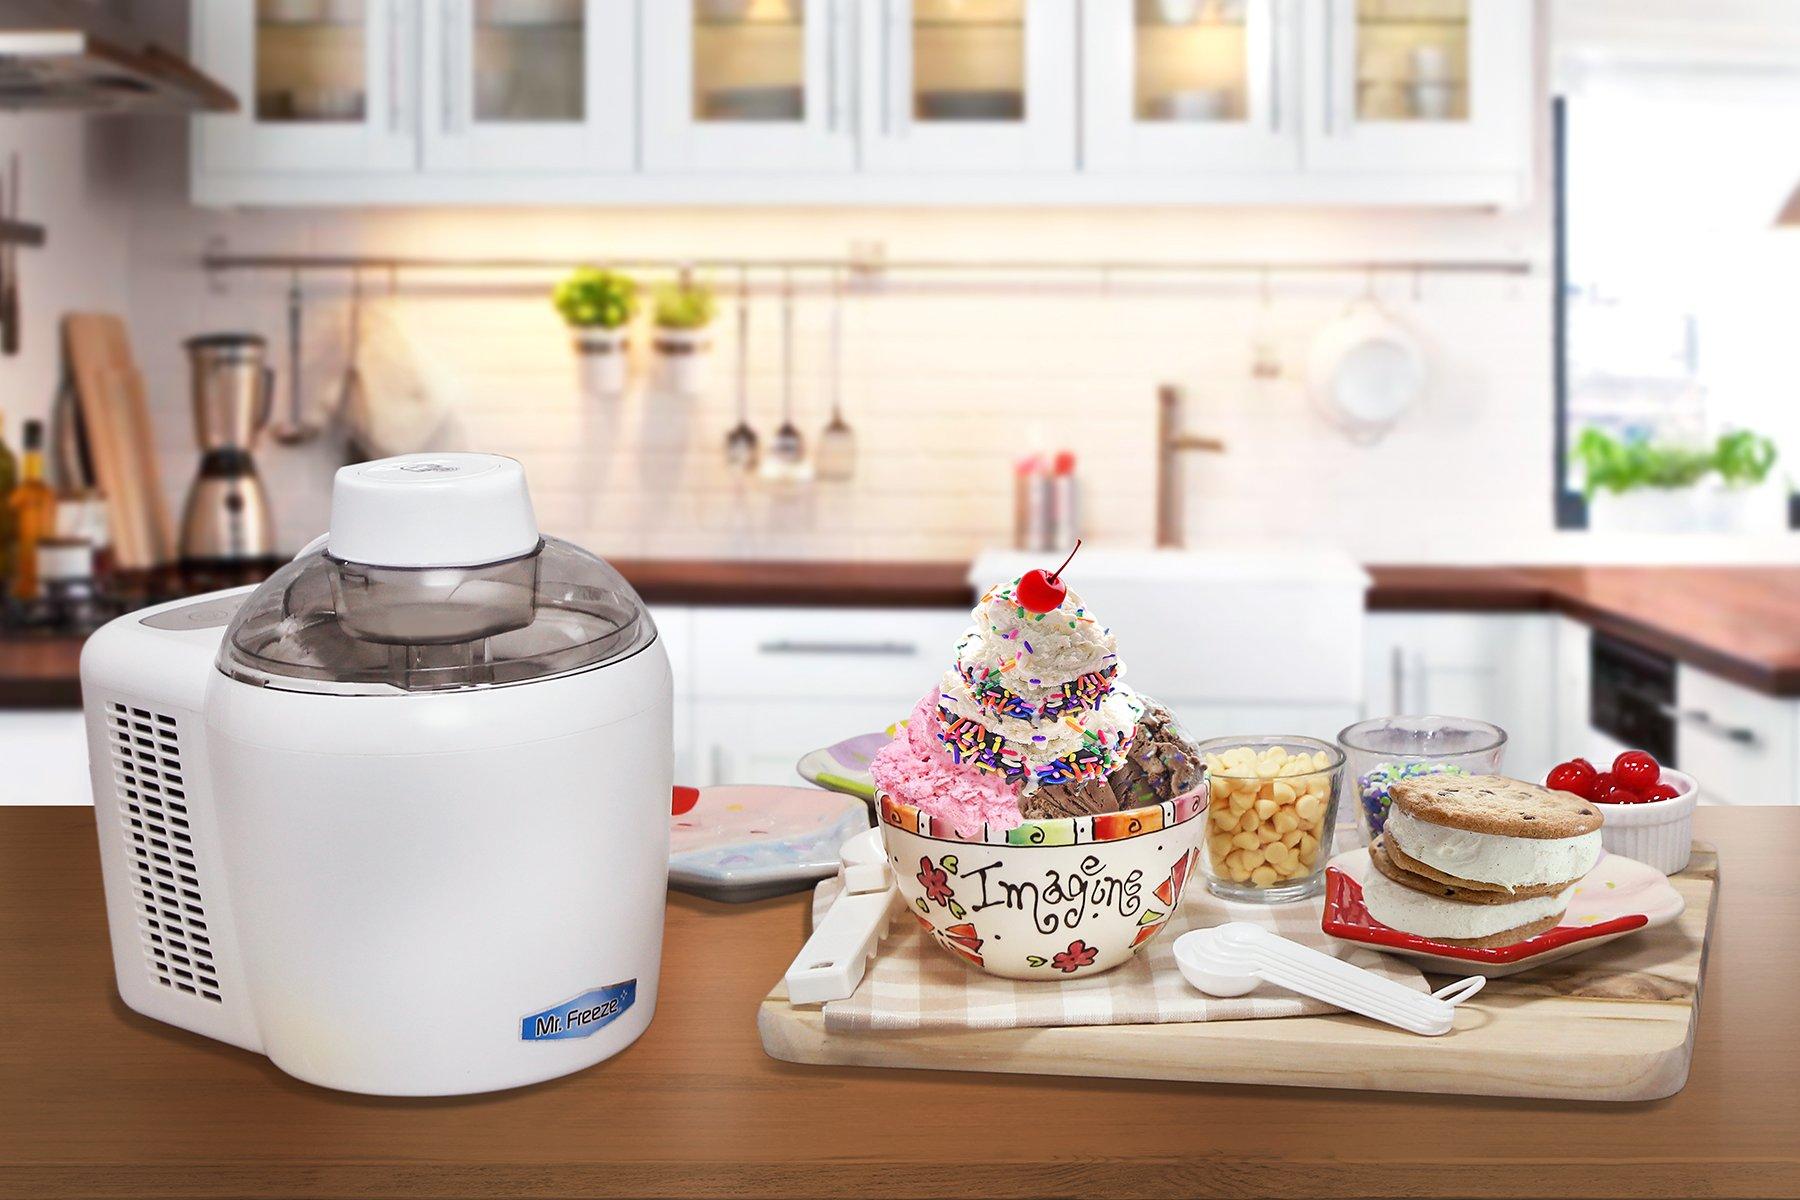 Mr. Freeze EIM-700 Self-Freezing Self-Refrigerating Ice Cream Maker, 1.5 Pint, White by Maxi-Matic (Image #7)